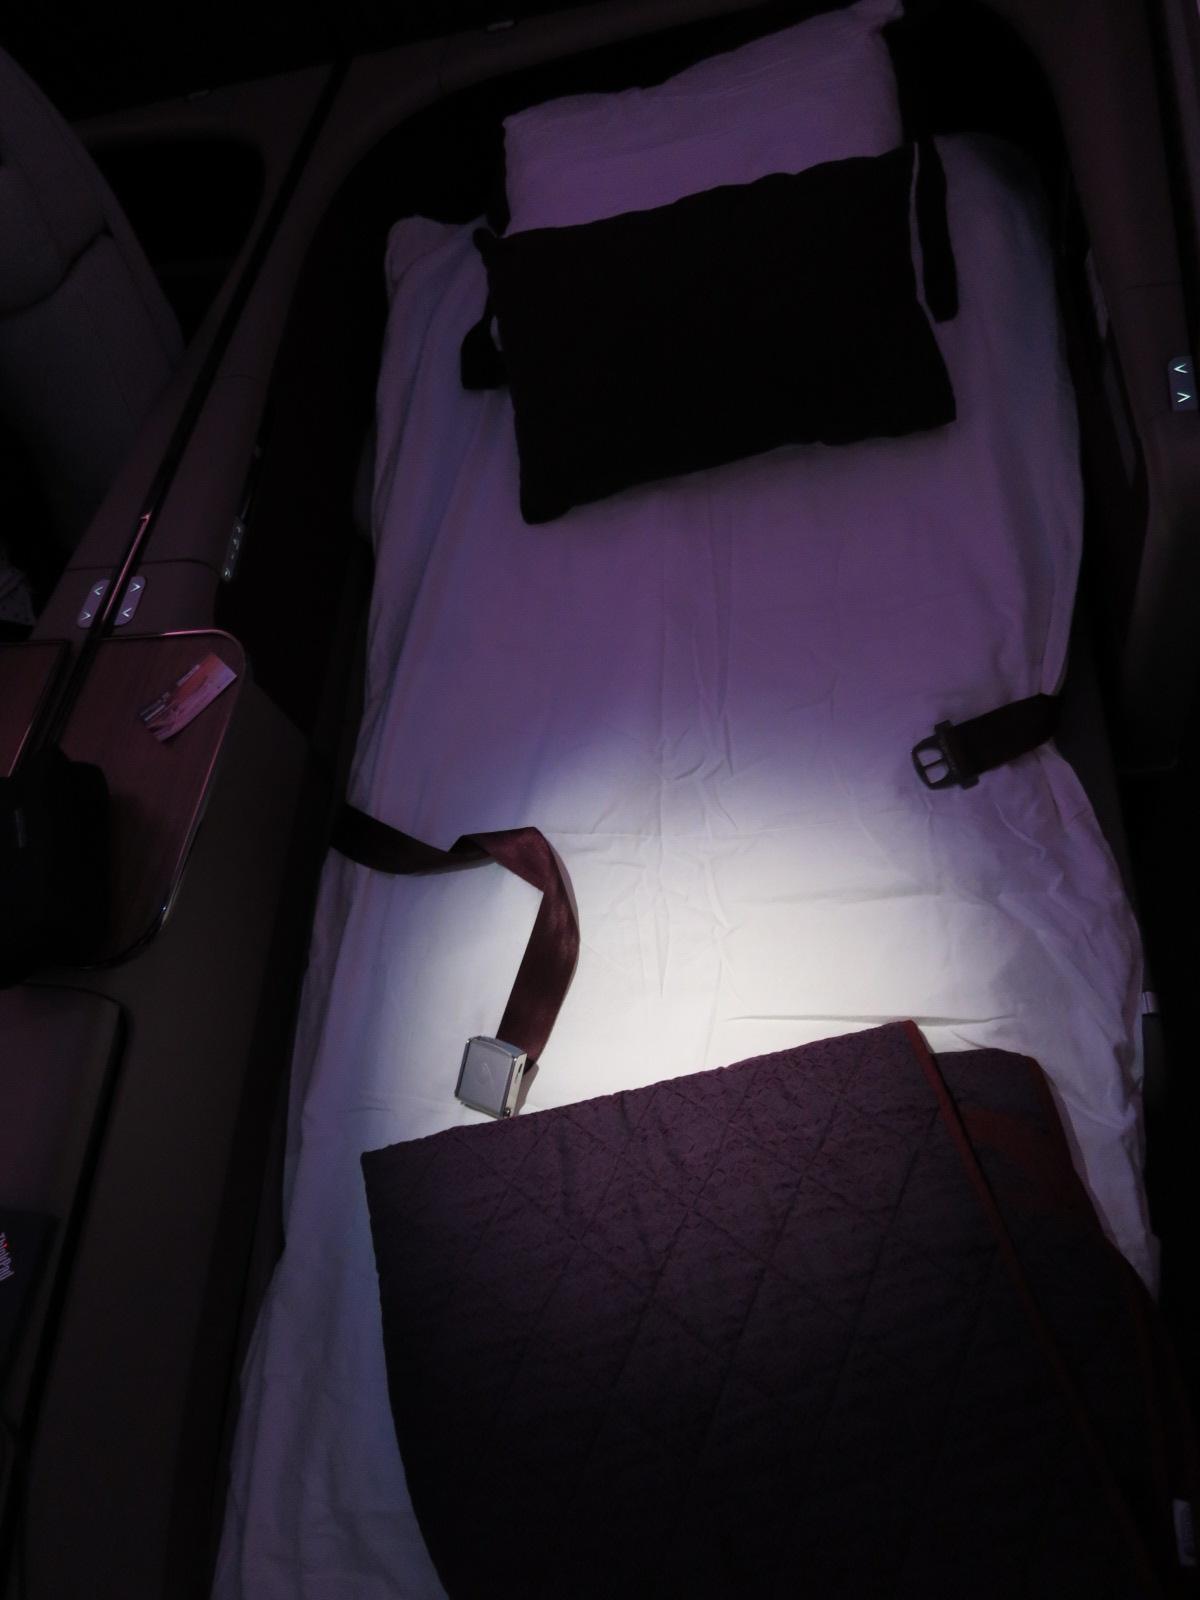 Qatar Airways A380 first class bed Bangkok-Doha